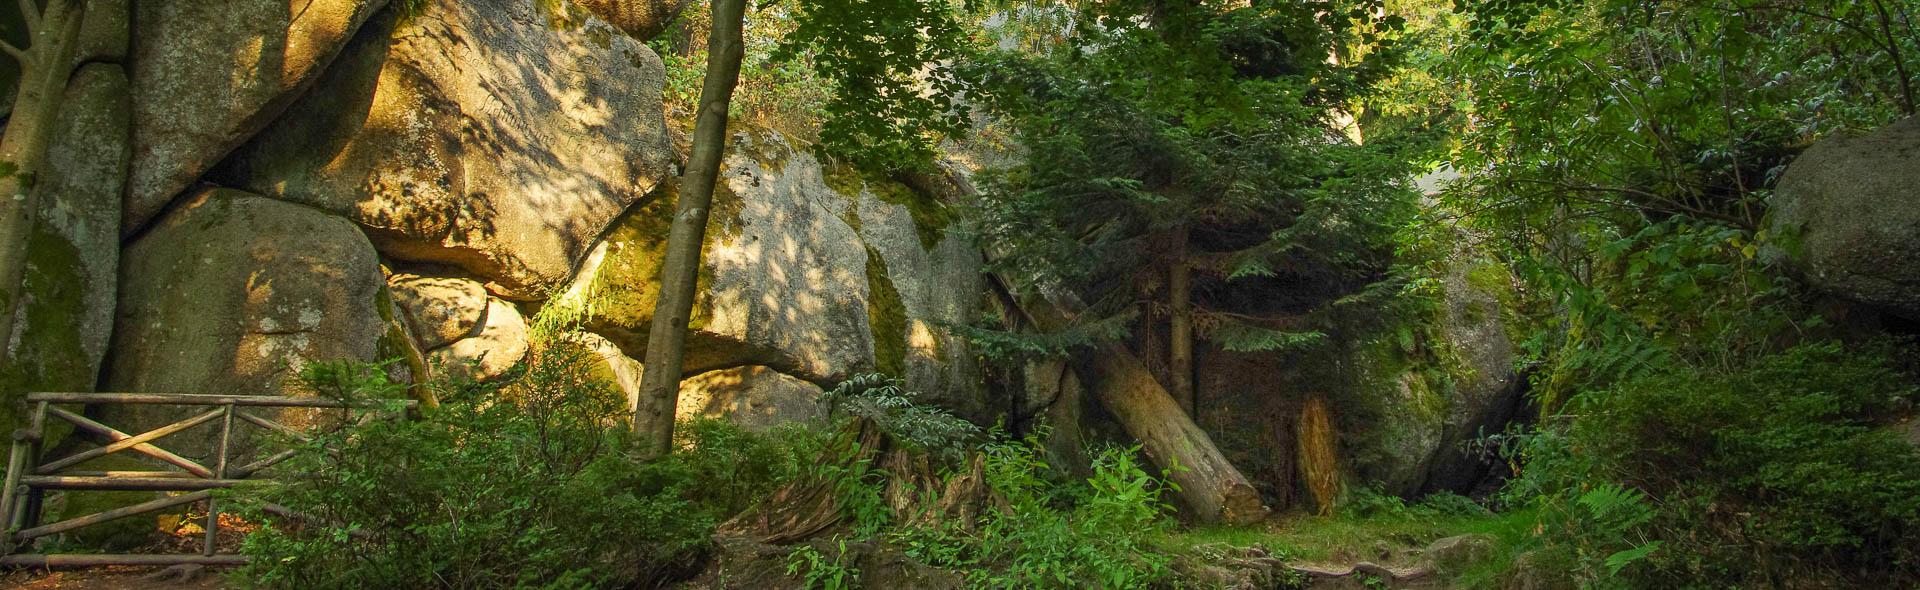 Im Felsenlabyrinth der Luisenburg